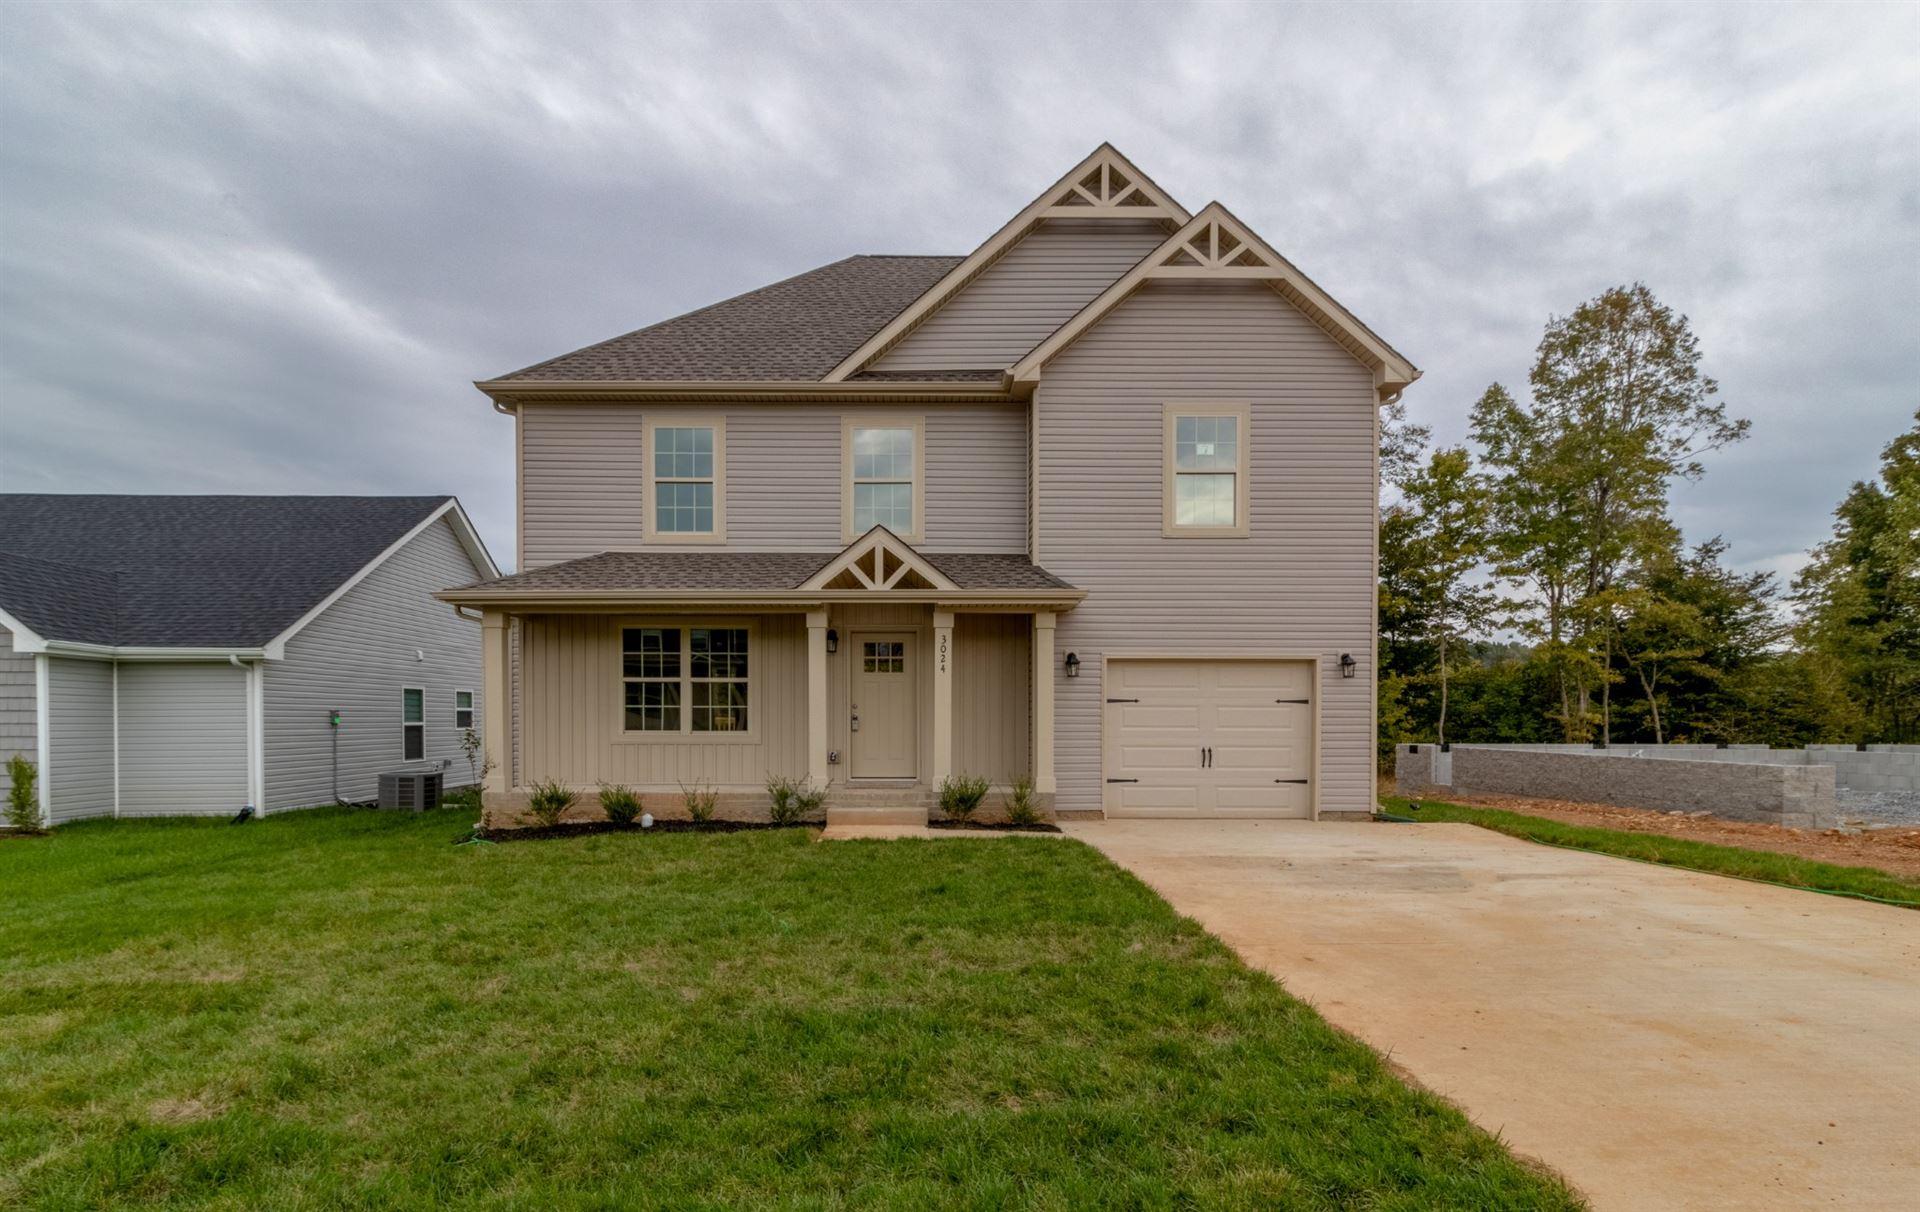 3024 Core Drive, Clarksville, TN 37040 - MLS#: 2300622